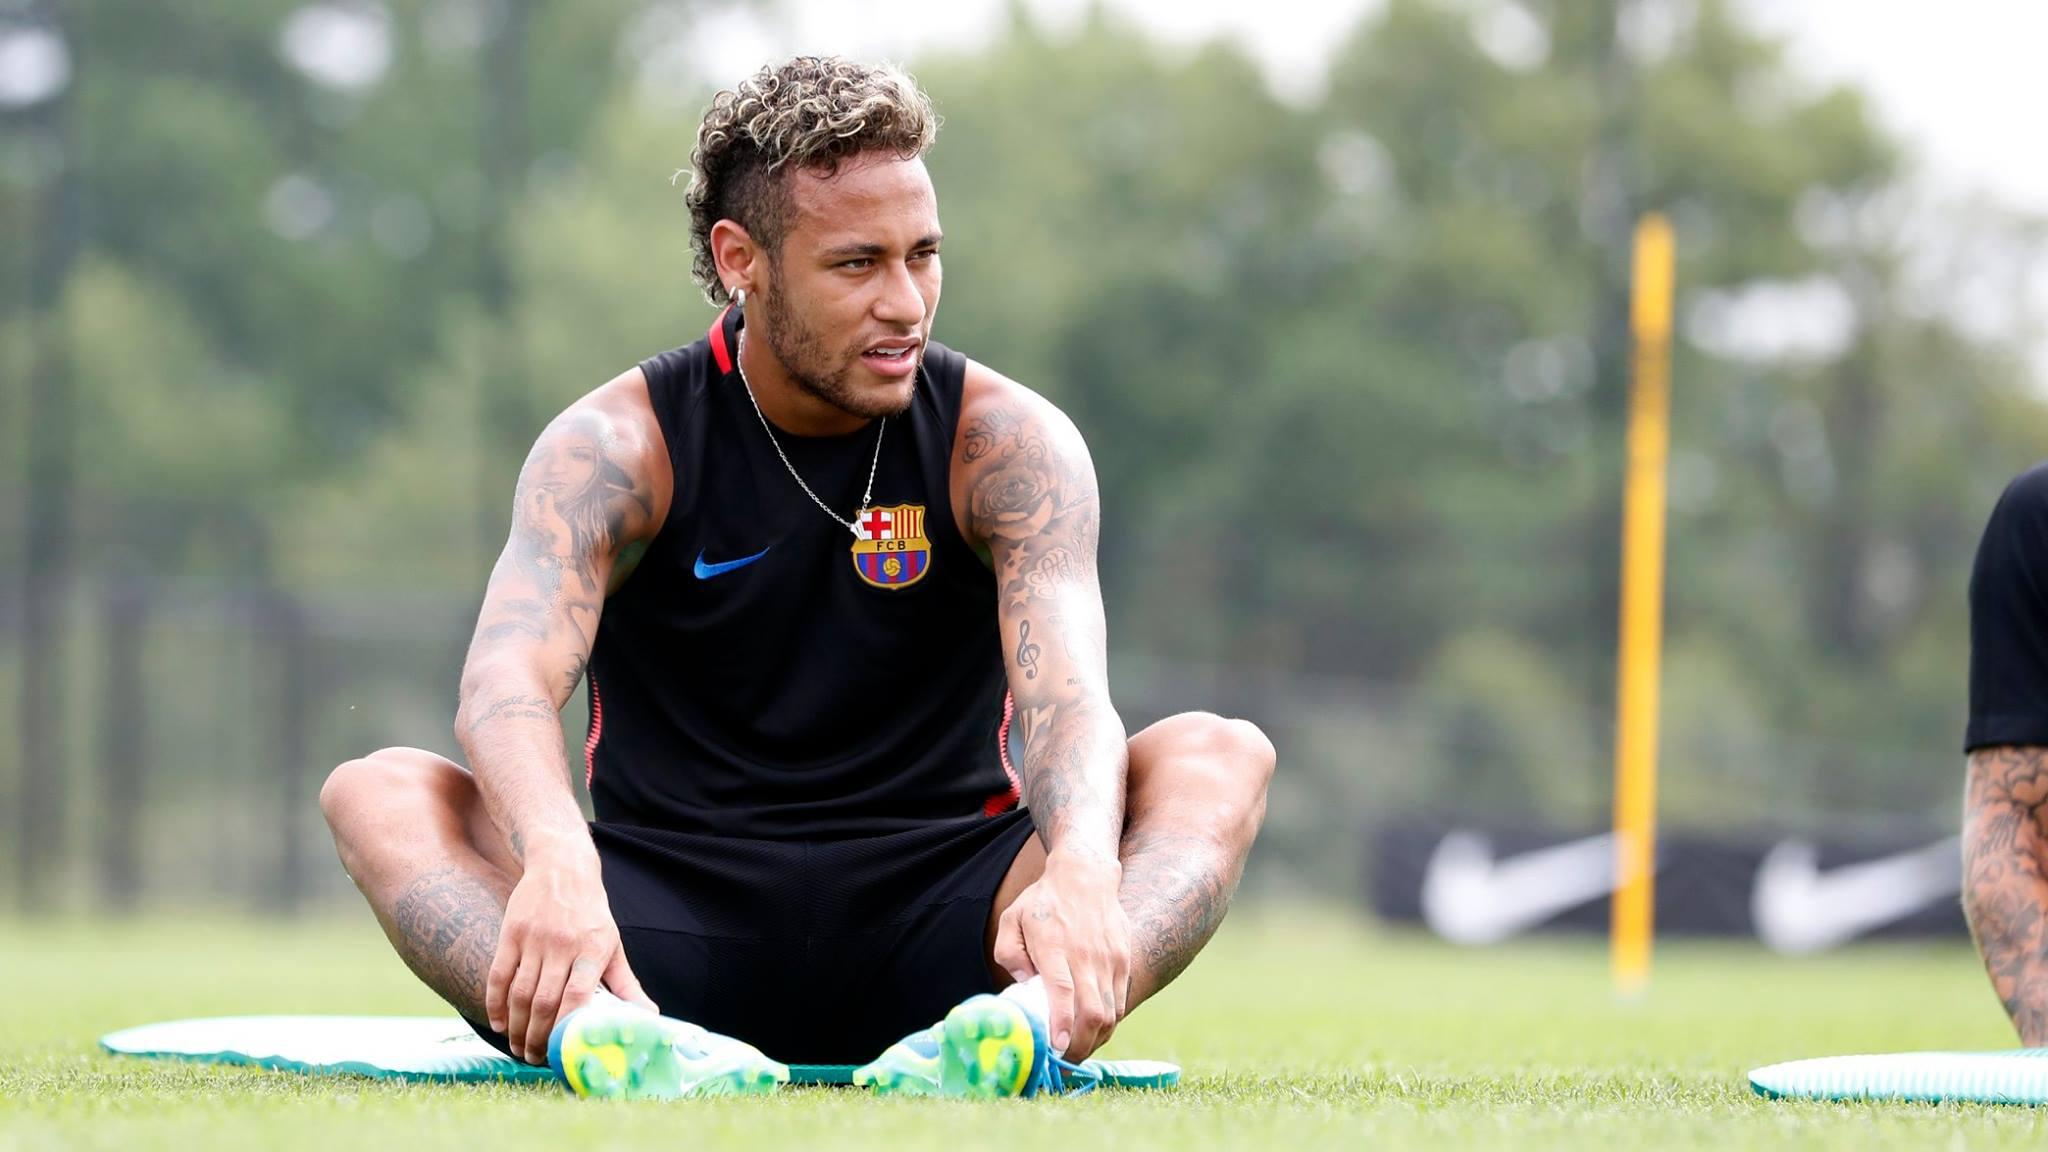 Piqué le mandó un fuerte mensaje a Neymar